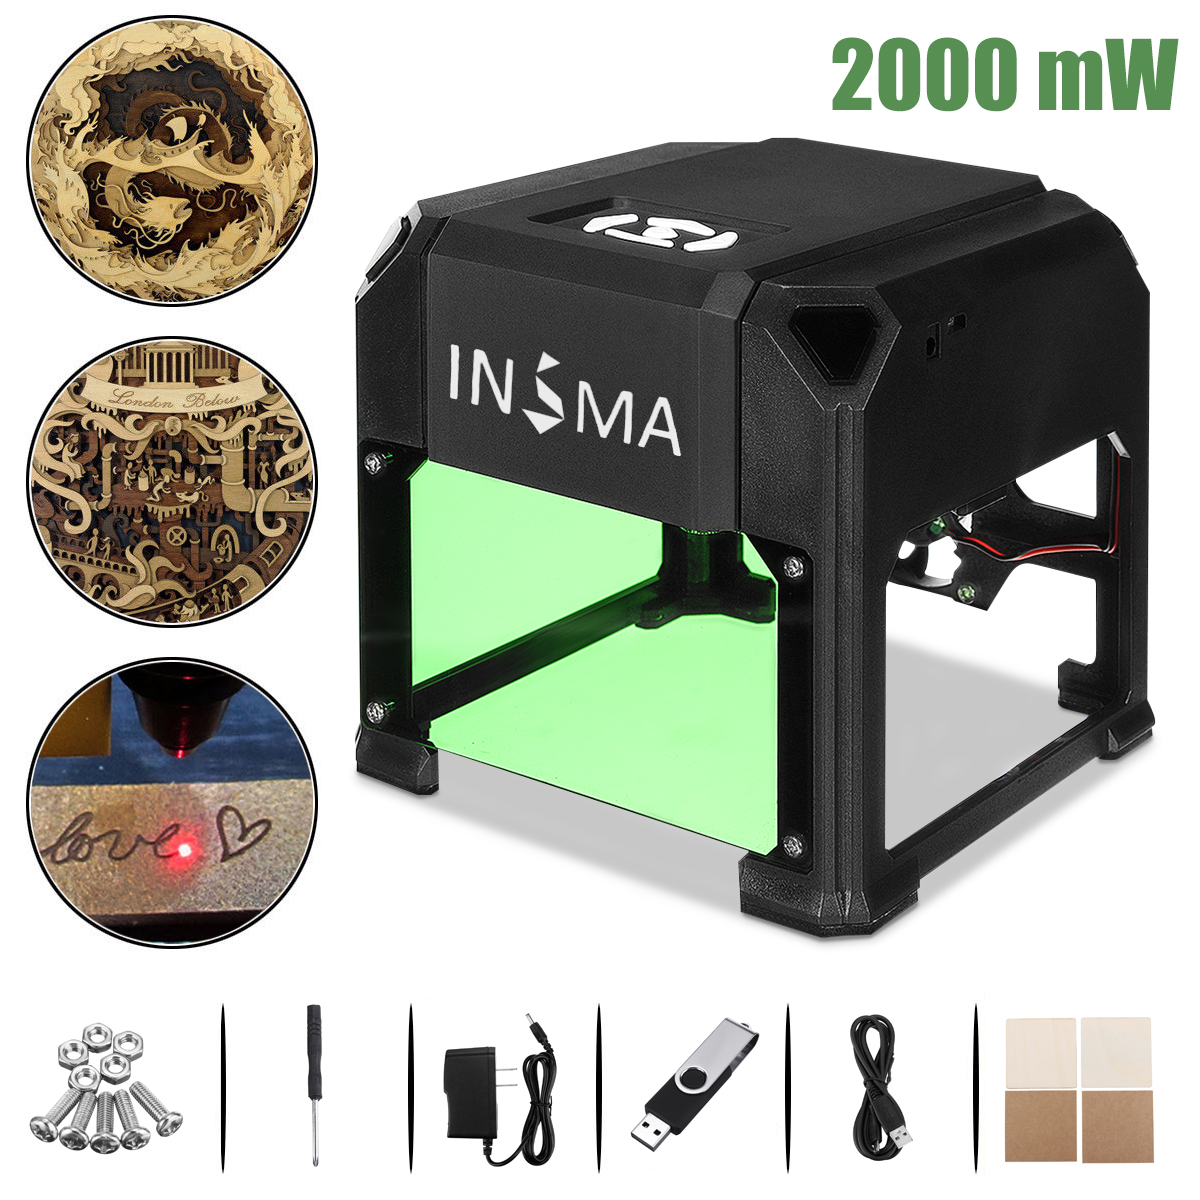 2000 mW CNC Laser Engraver DIY Logo Mark Printer Cutter Laser Engraving Machine Woodworking 80x80mm